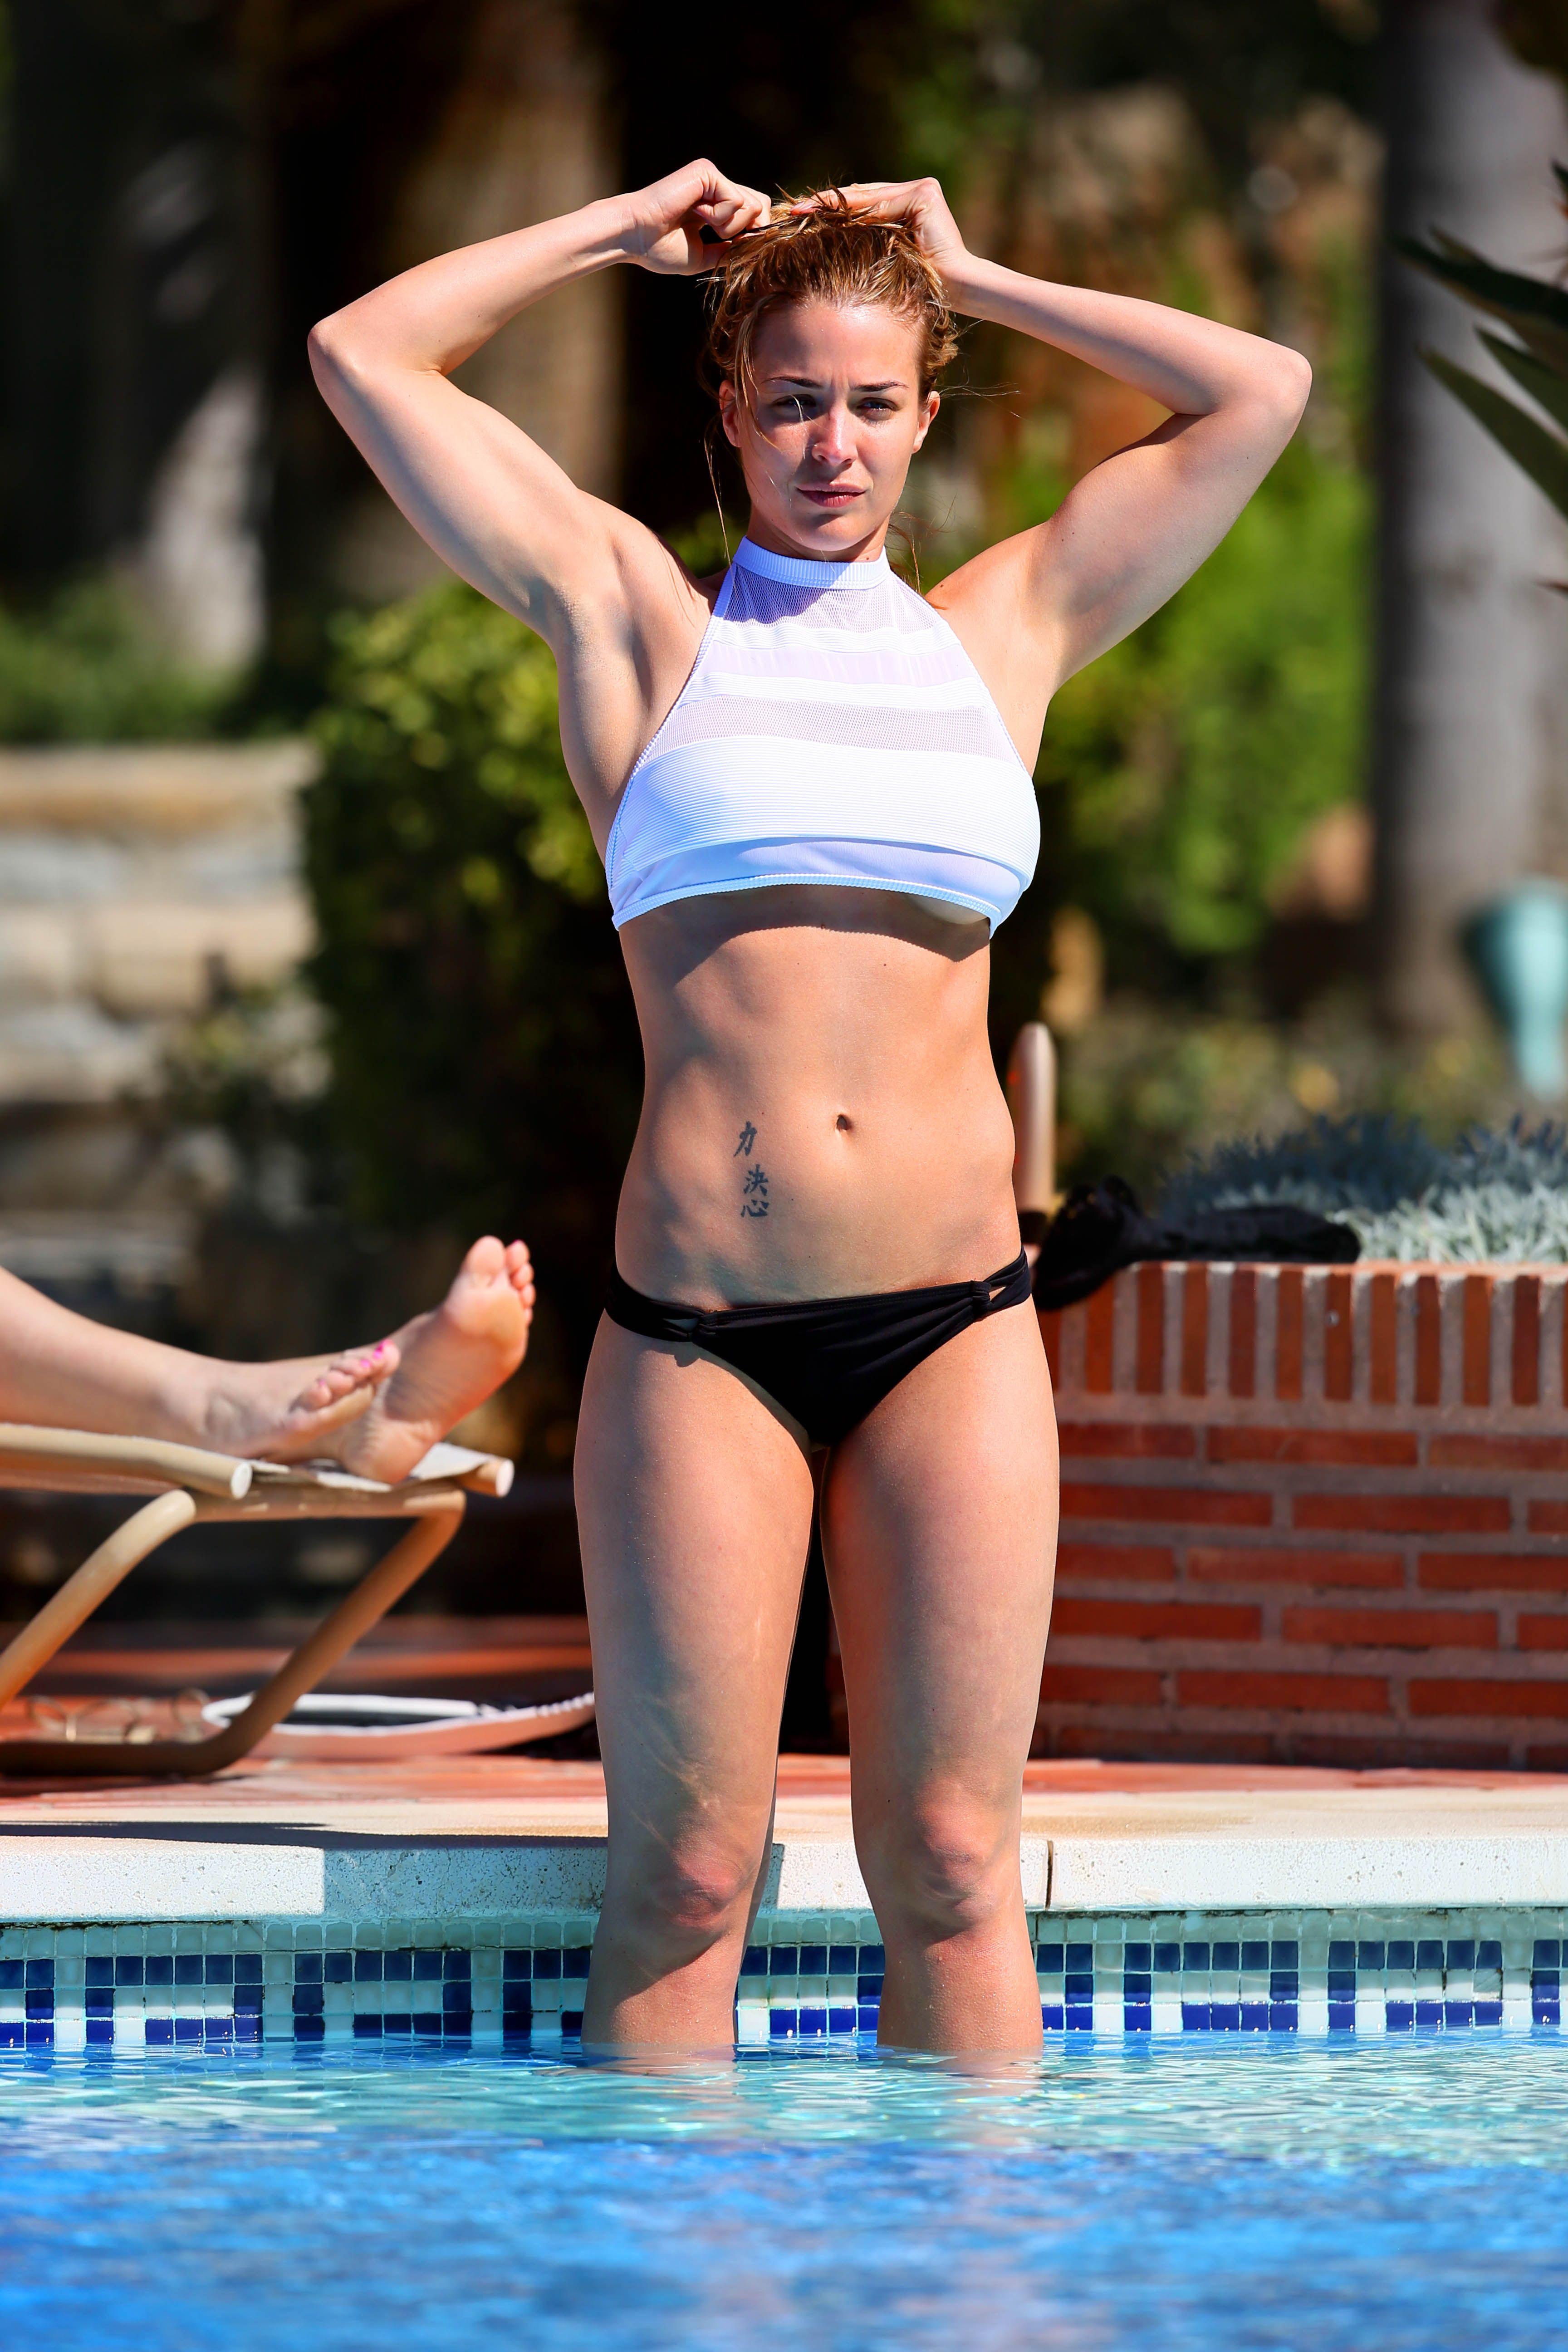 Gemma atkinson bikini think, that